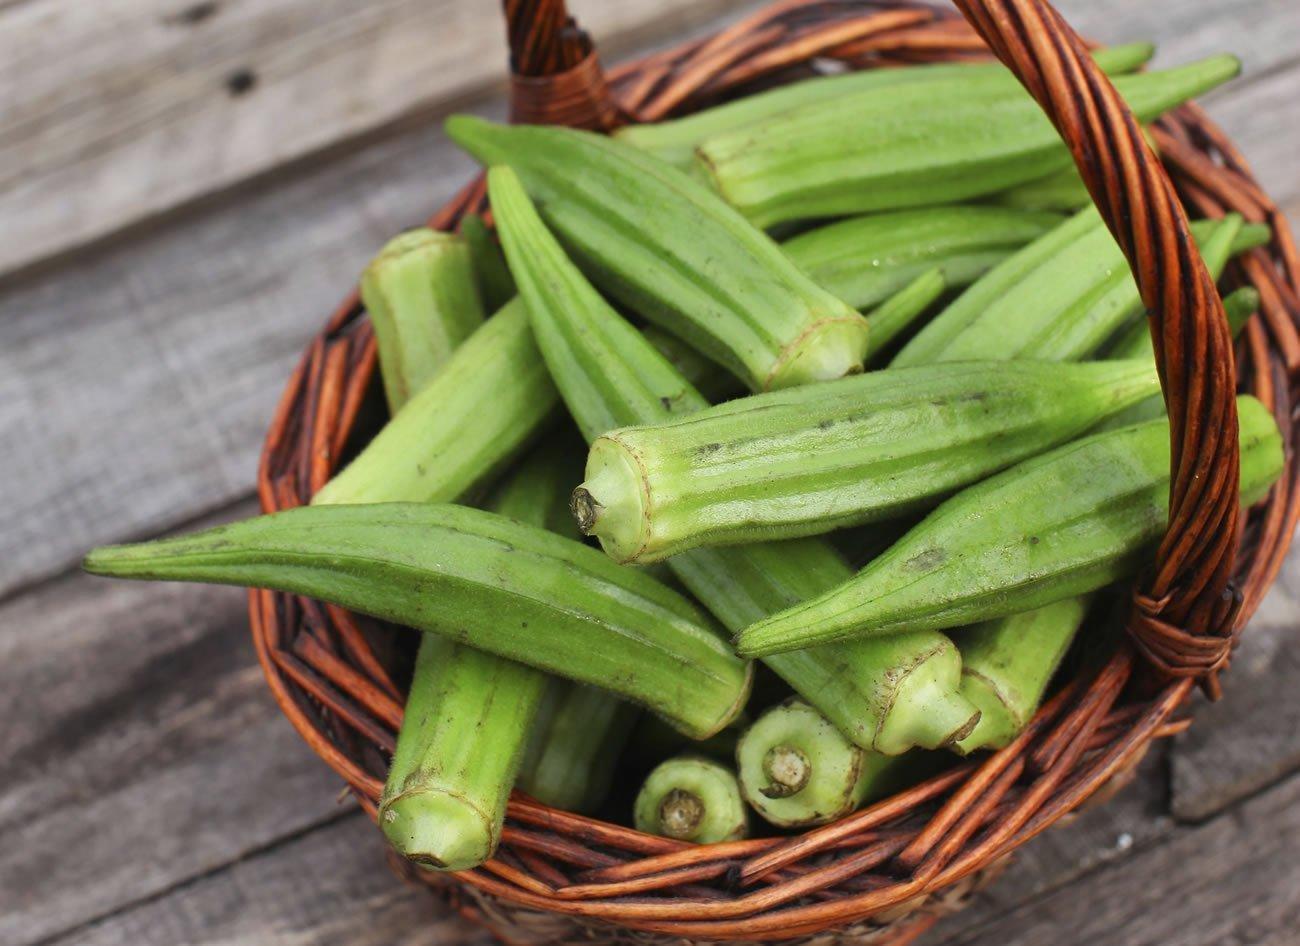 Is Okra Good For Diabetes?